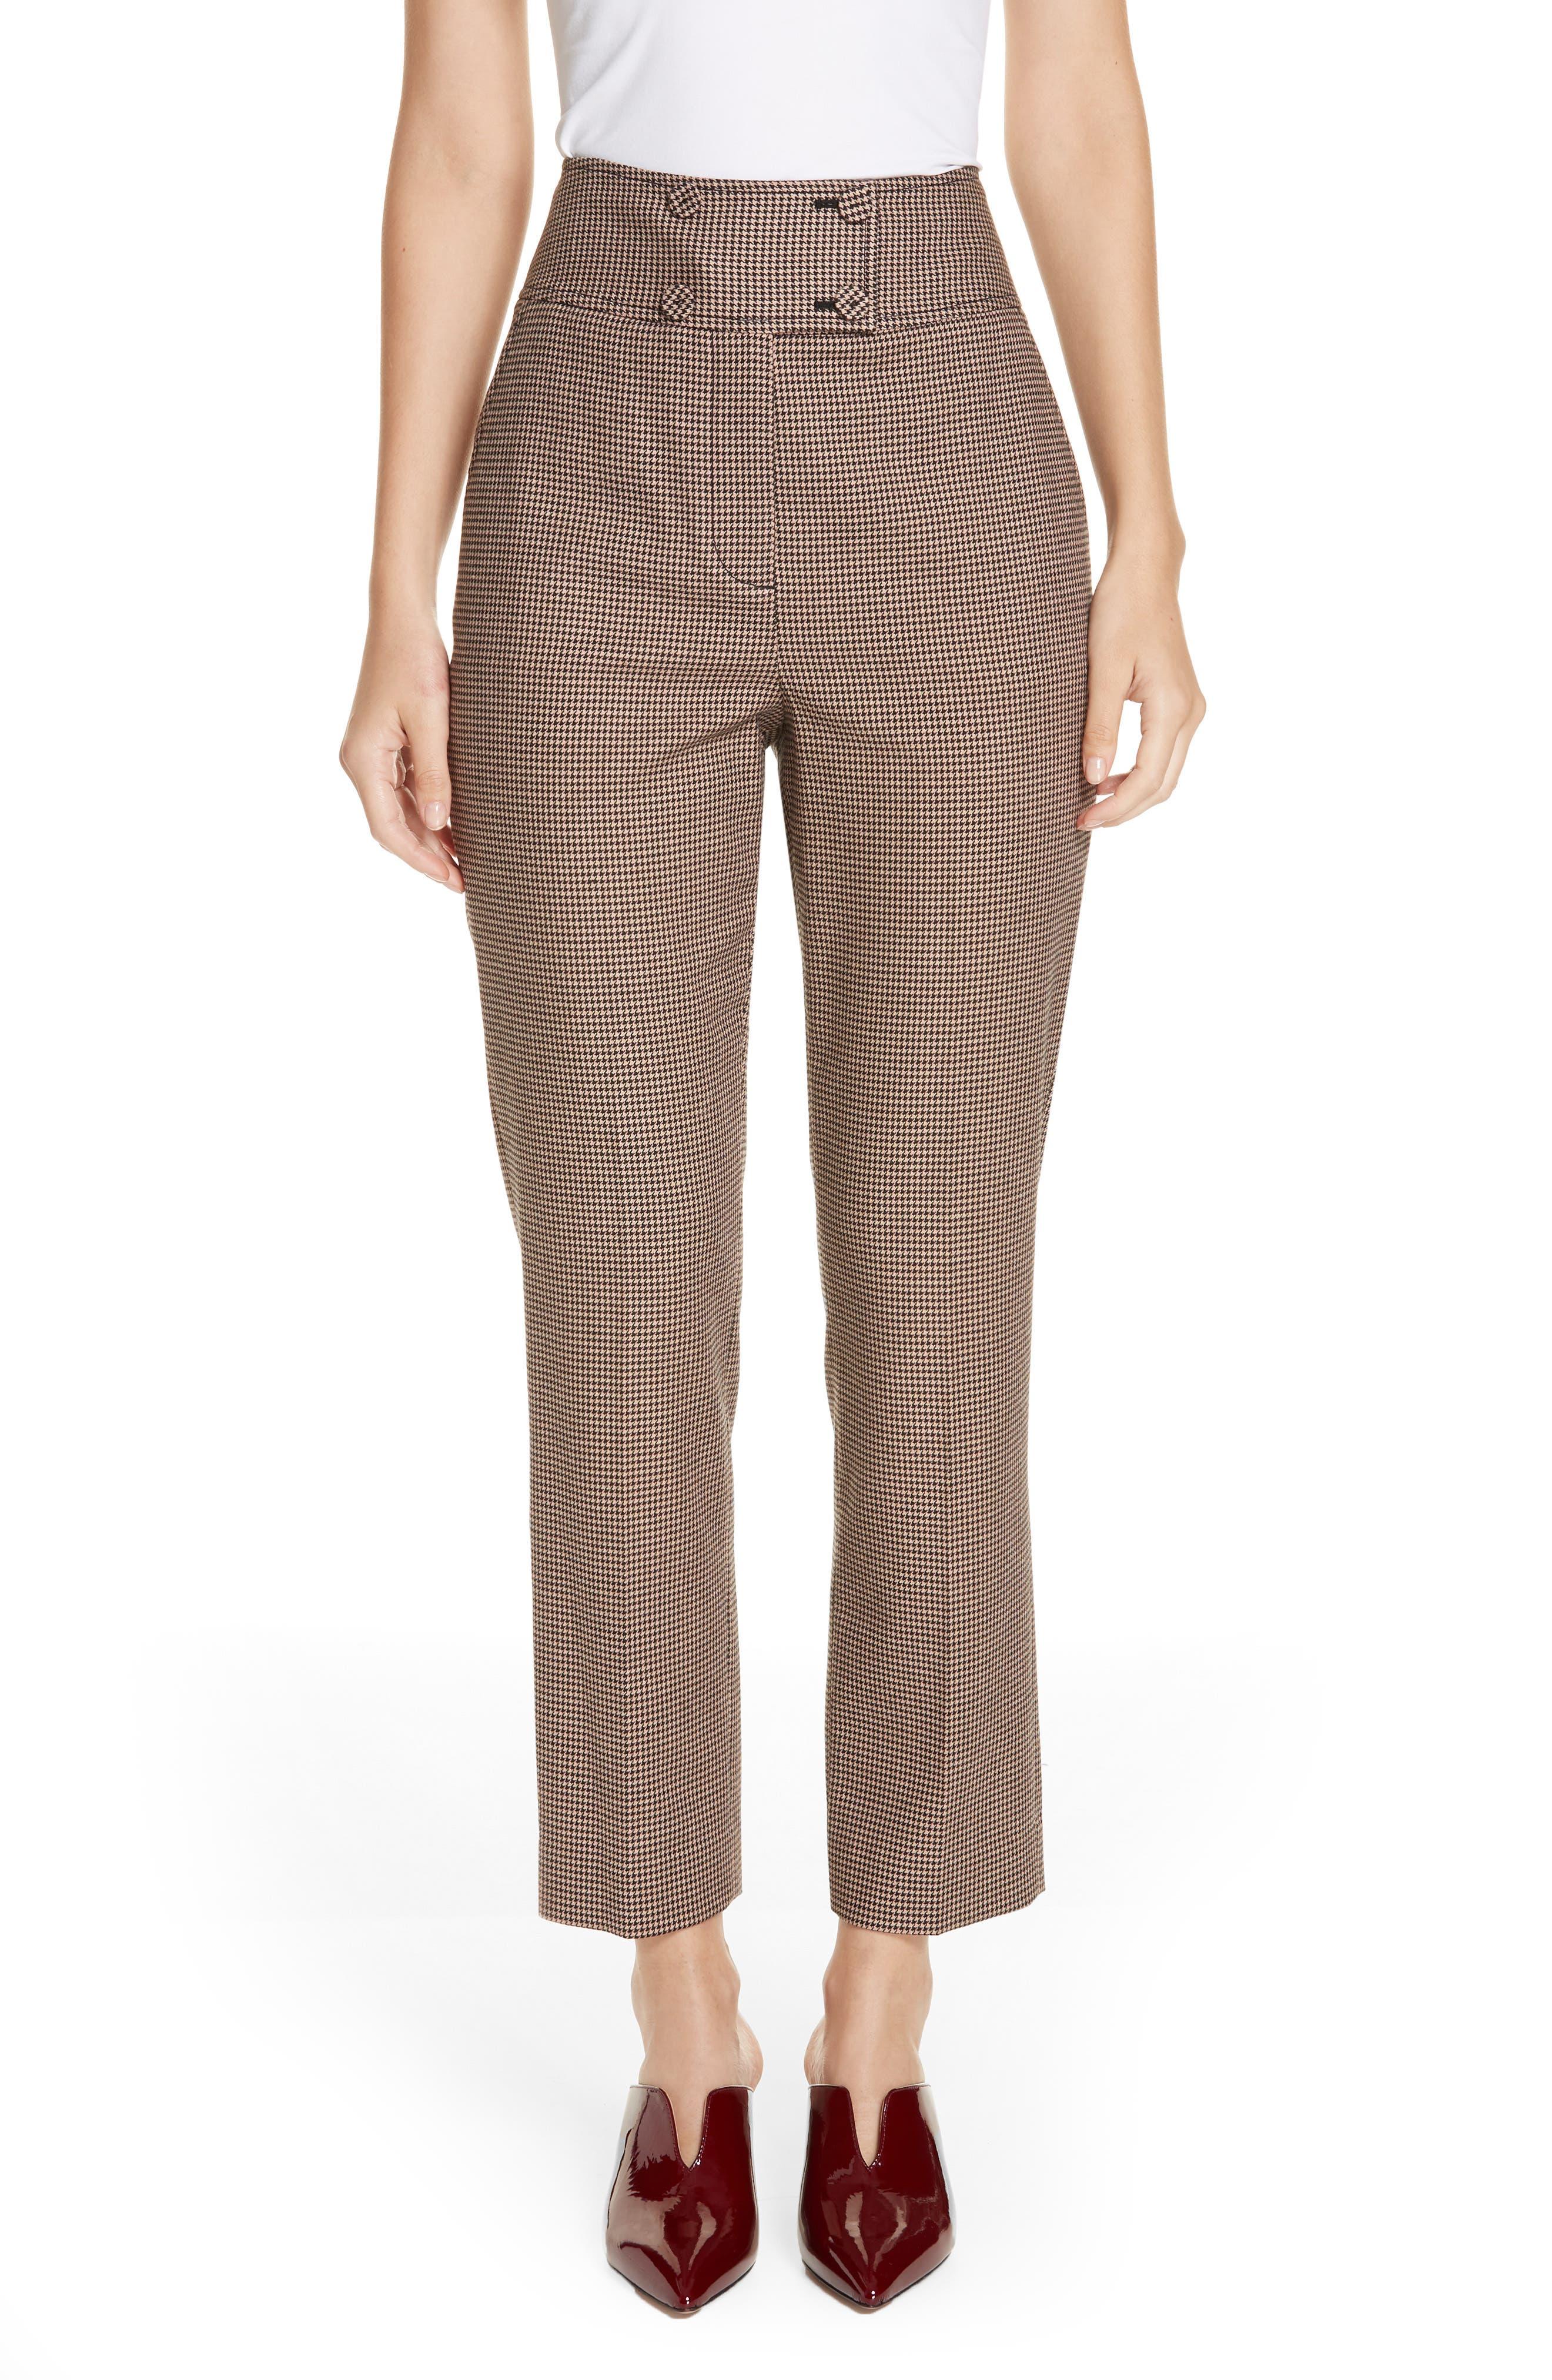 Houndstooth Check Stretch Cotton Blend Pants,                         Main,                         color, CAMEL/ BLACK